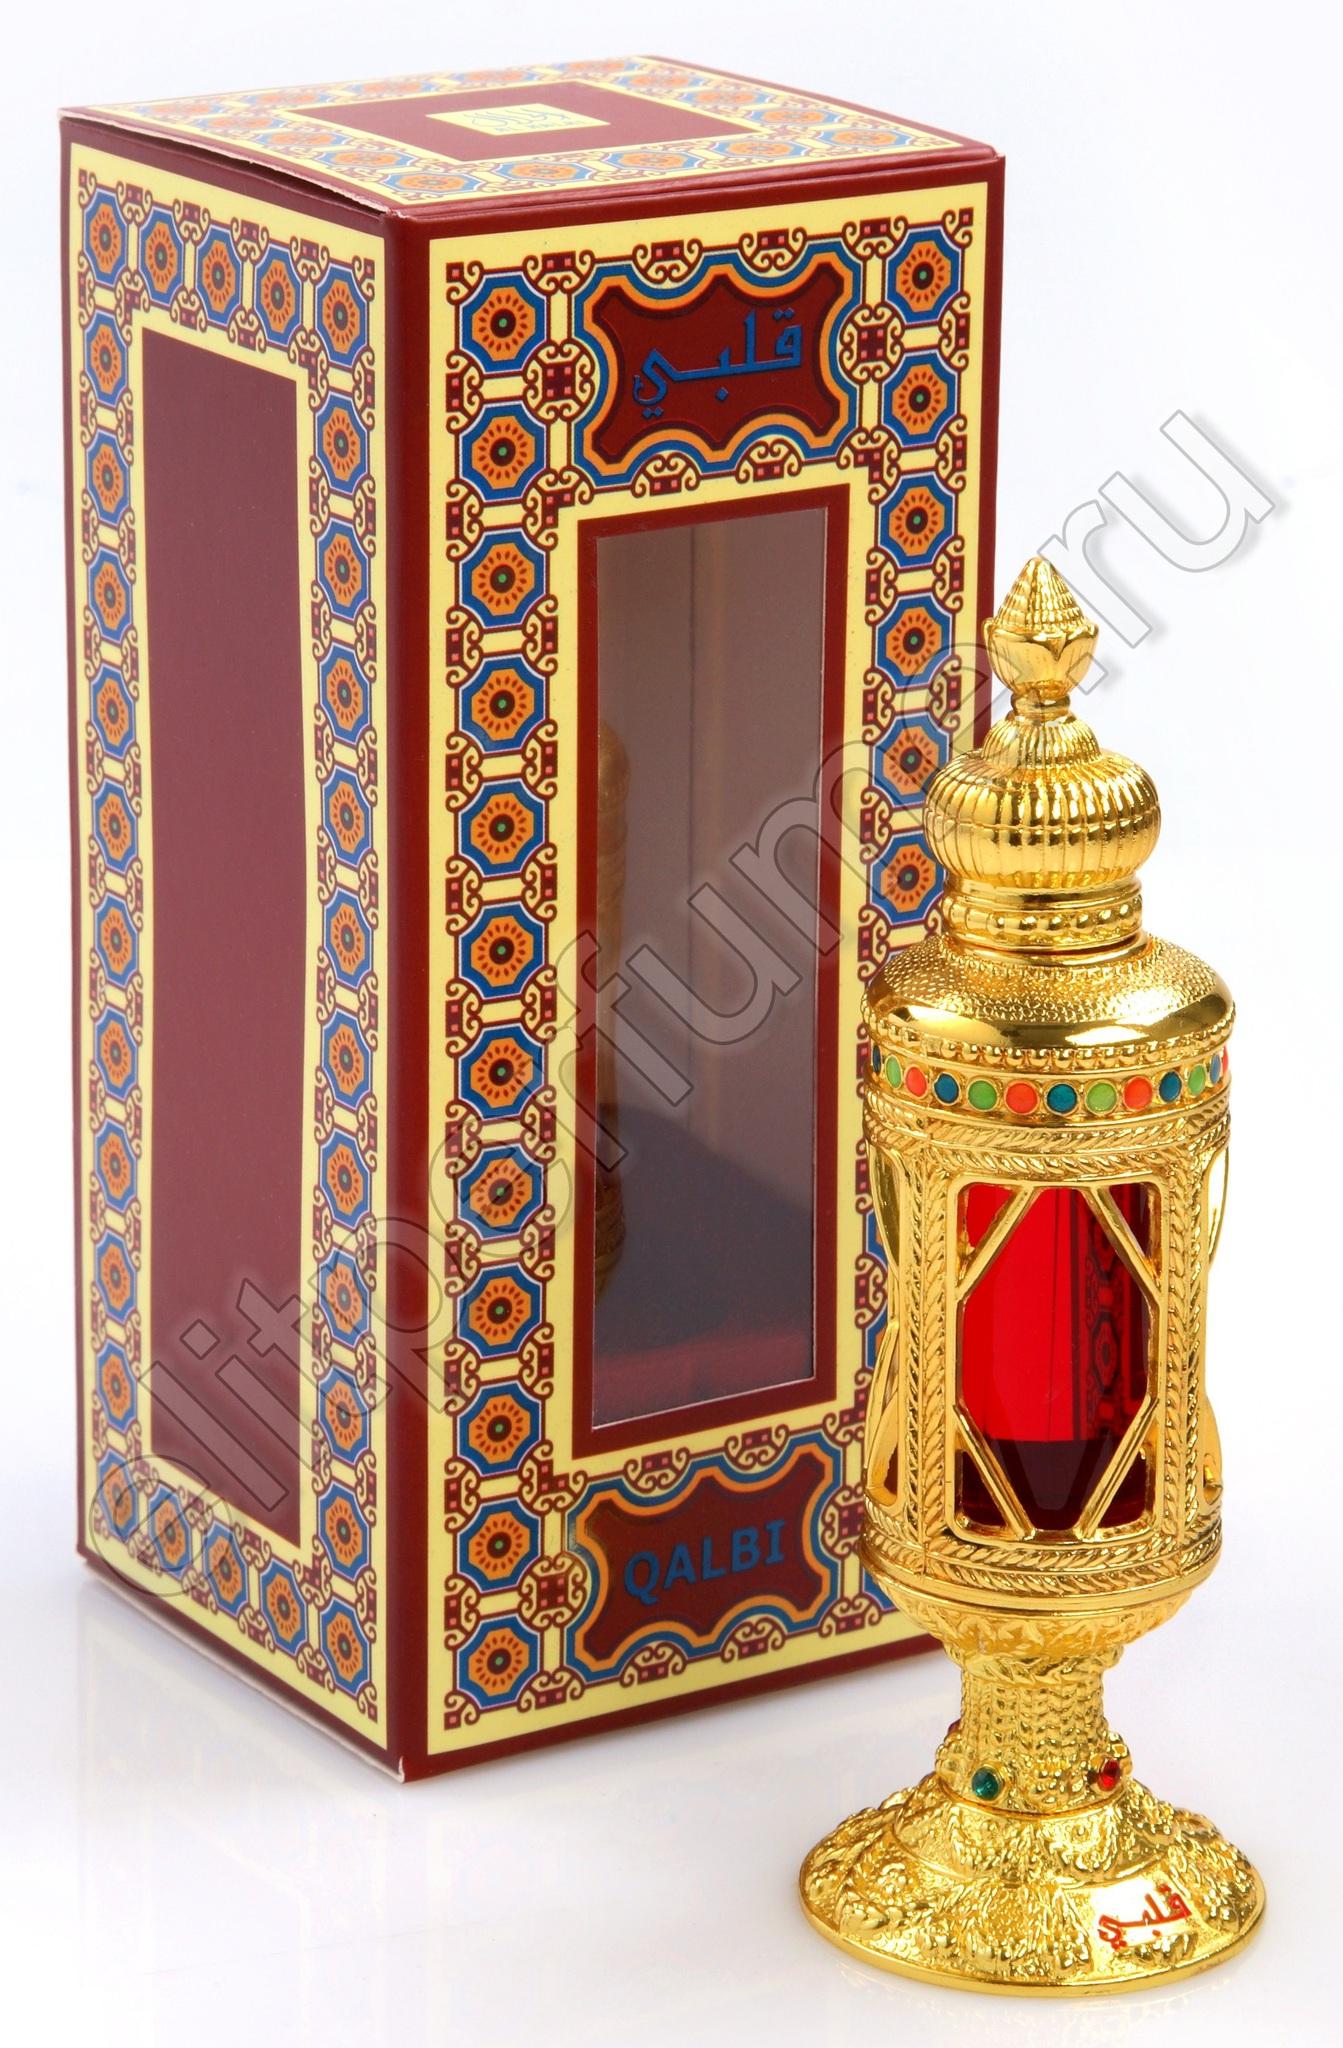 Кальби Qalbi 18 мл арабские масляные духи от Аль Харамайн Al Haramain Perfumes